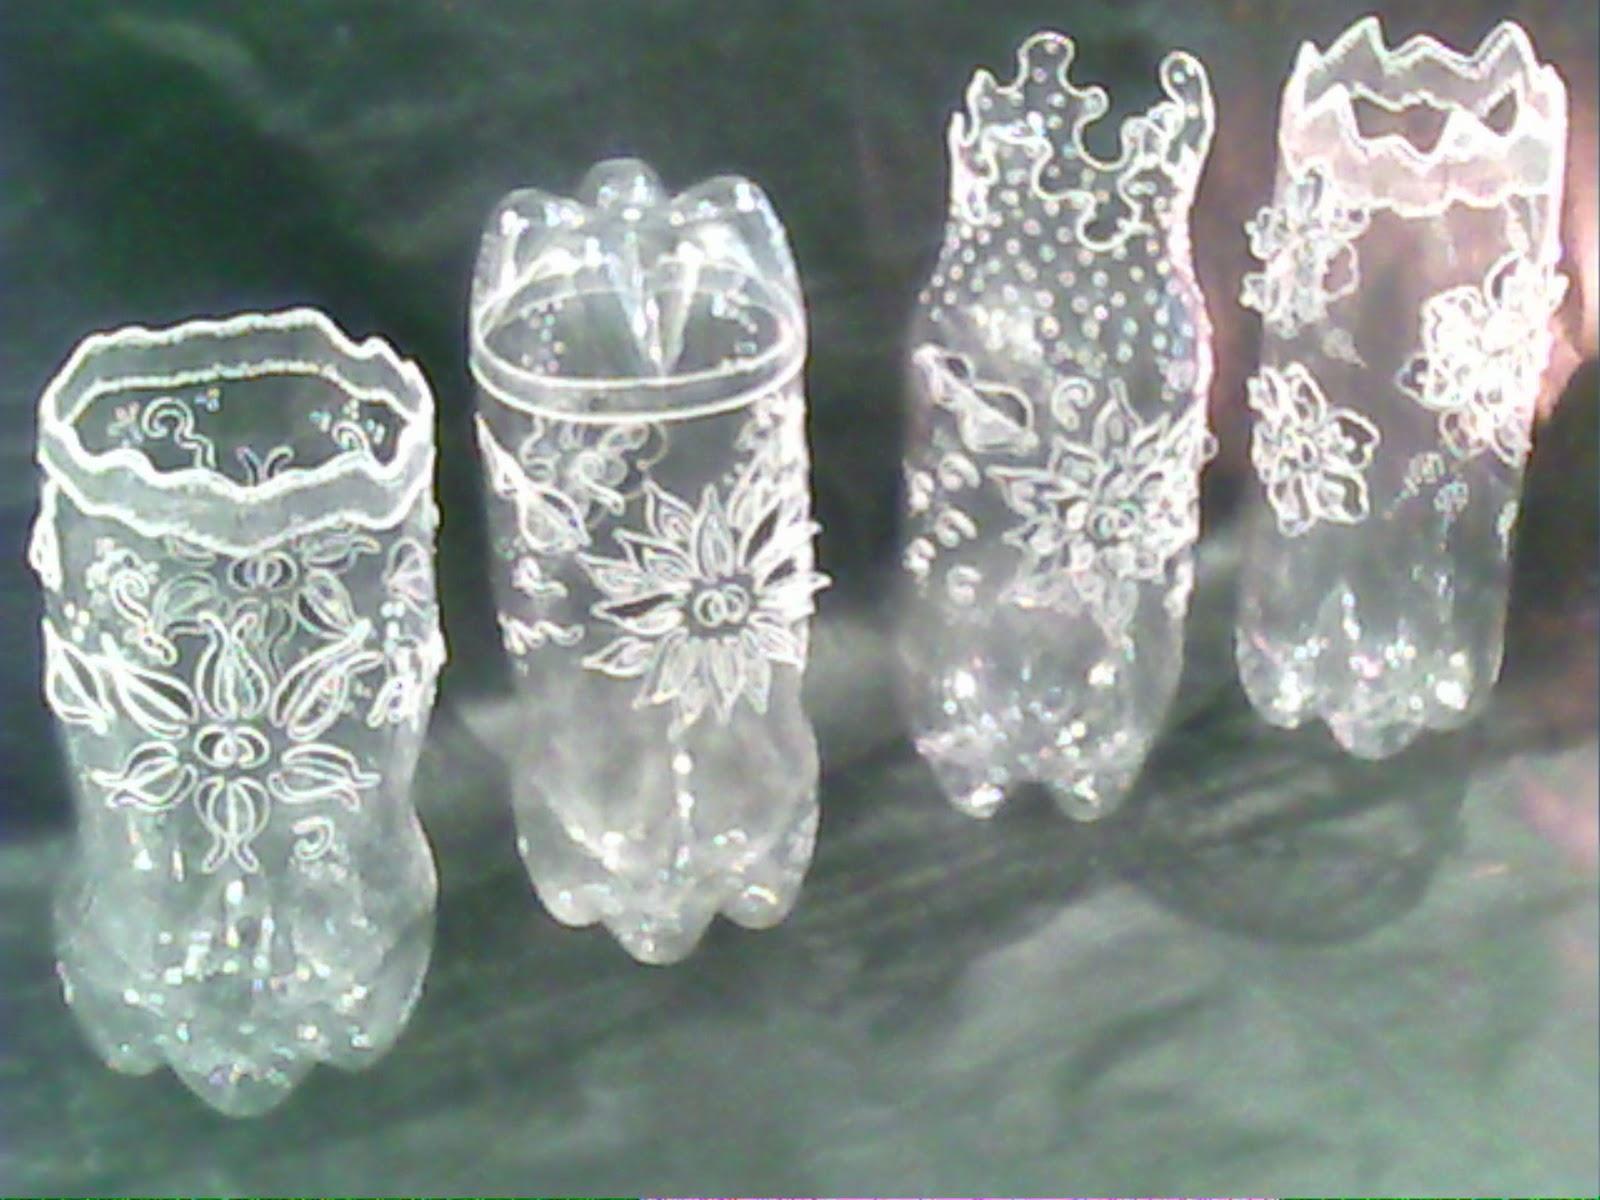 Garrafas Pet Decoradas 1 Vasos Ecológicos Suspensos Ou De Mesa